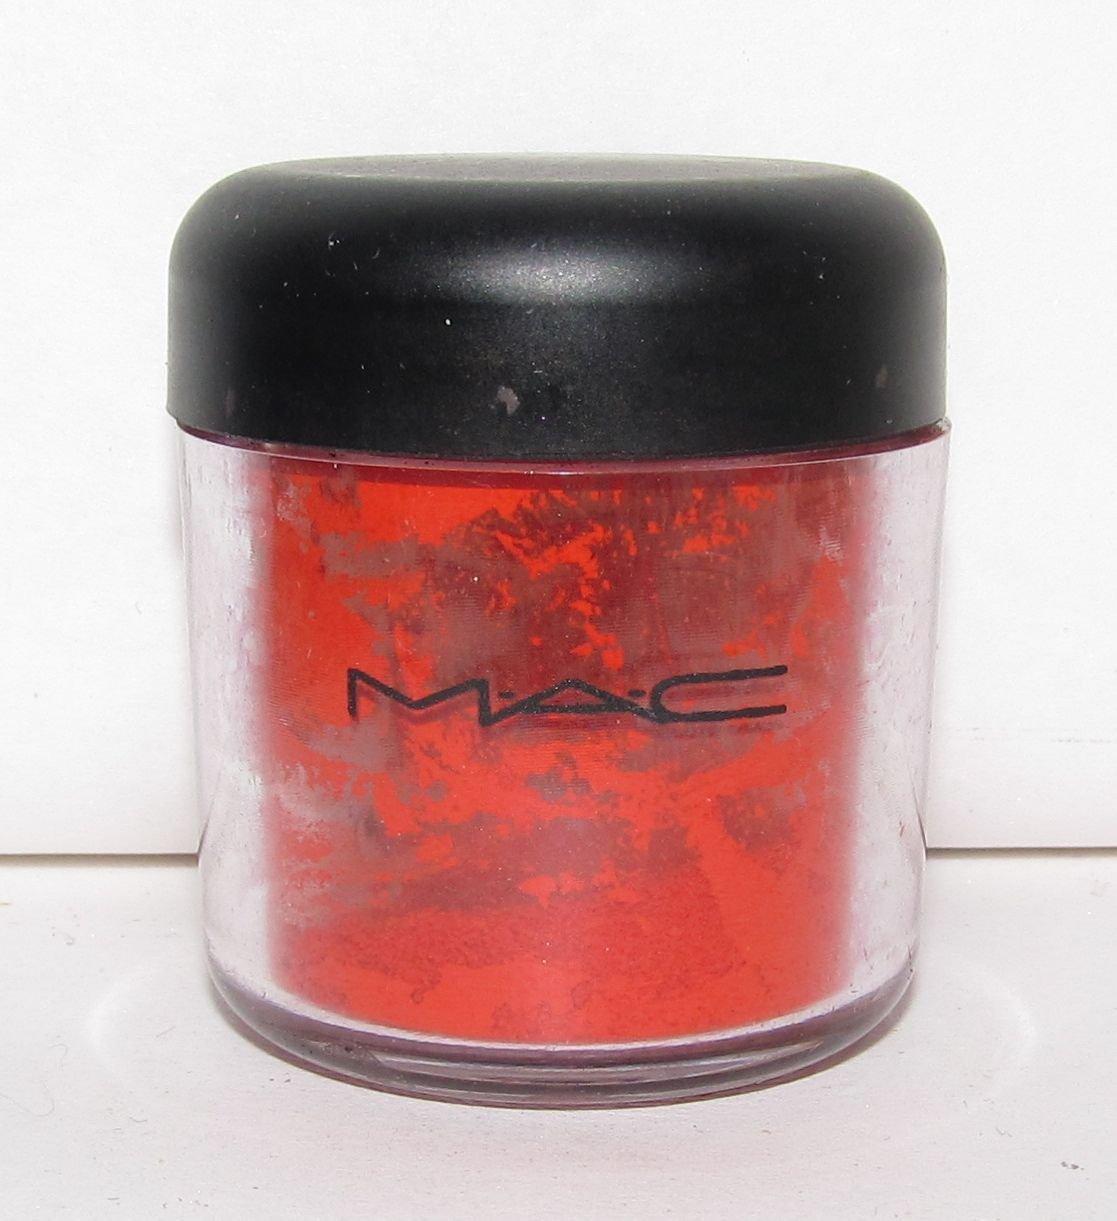 MAC - Red Pigment 1/4 tsp Sample in Original Jar  - HTF - RARE!